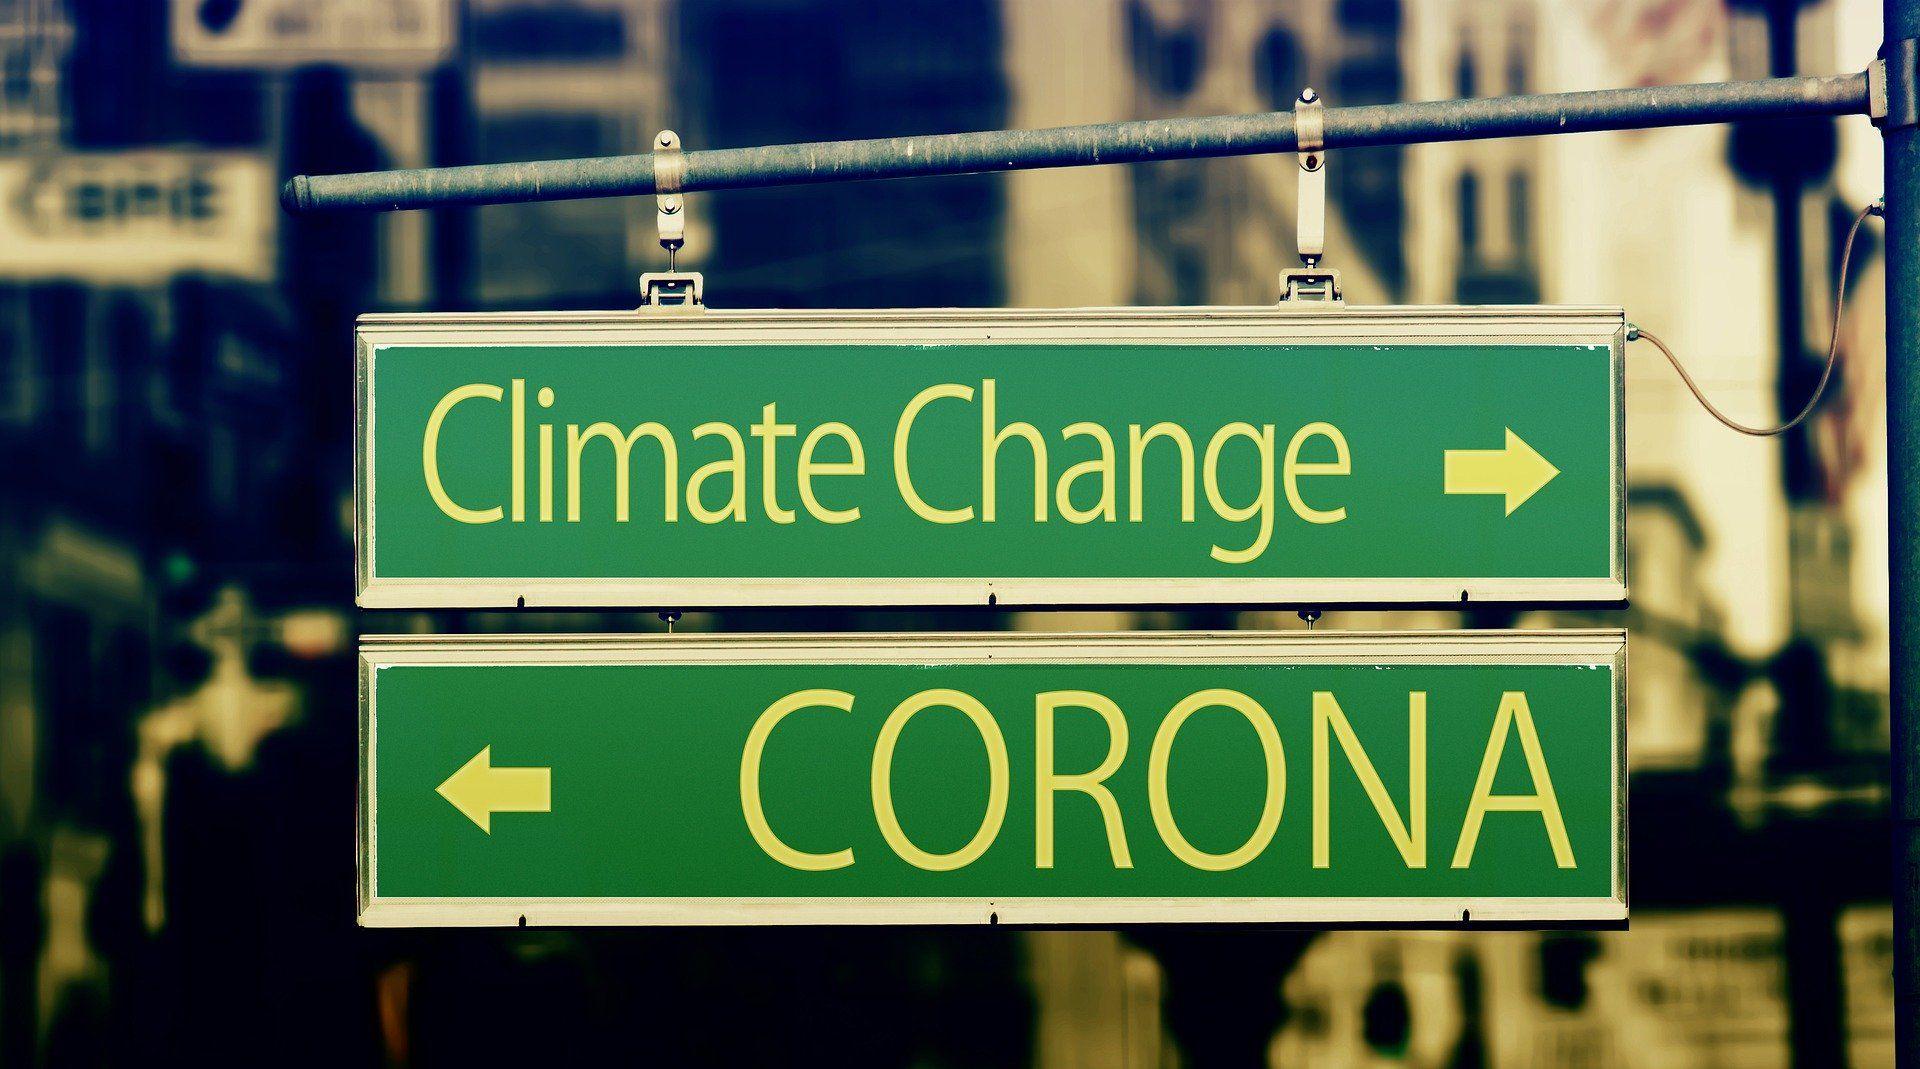 Klimawandel bereitet soviel Sorgen wie Corona